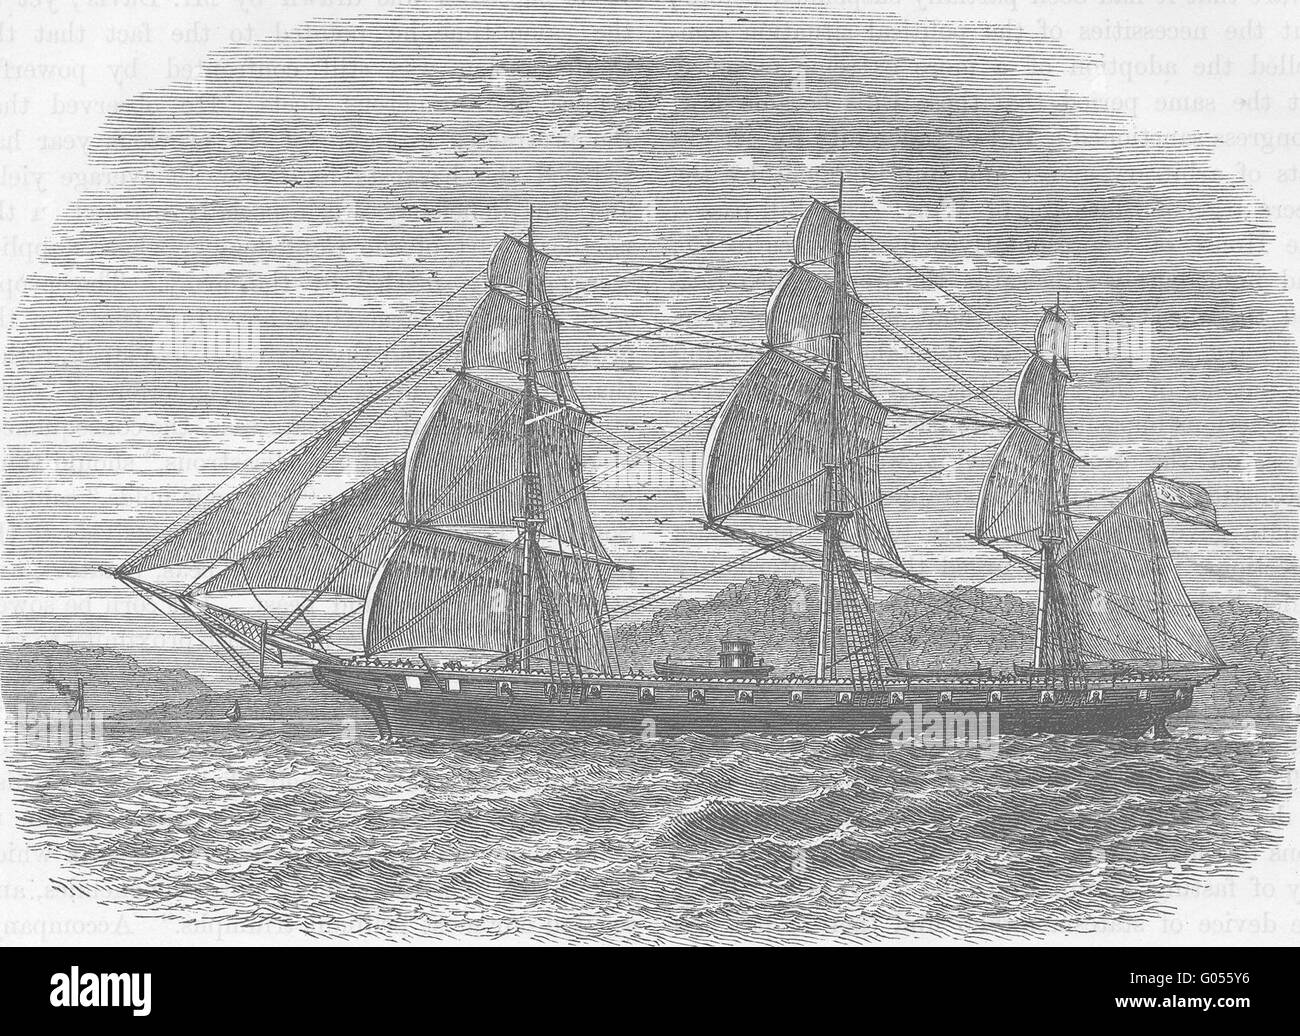 USA: Civil War: Hartford(Adm Farragut's flagship), antique print c1880 Stock Photo